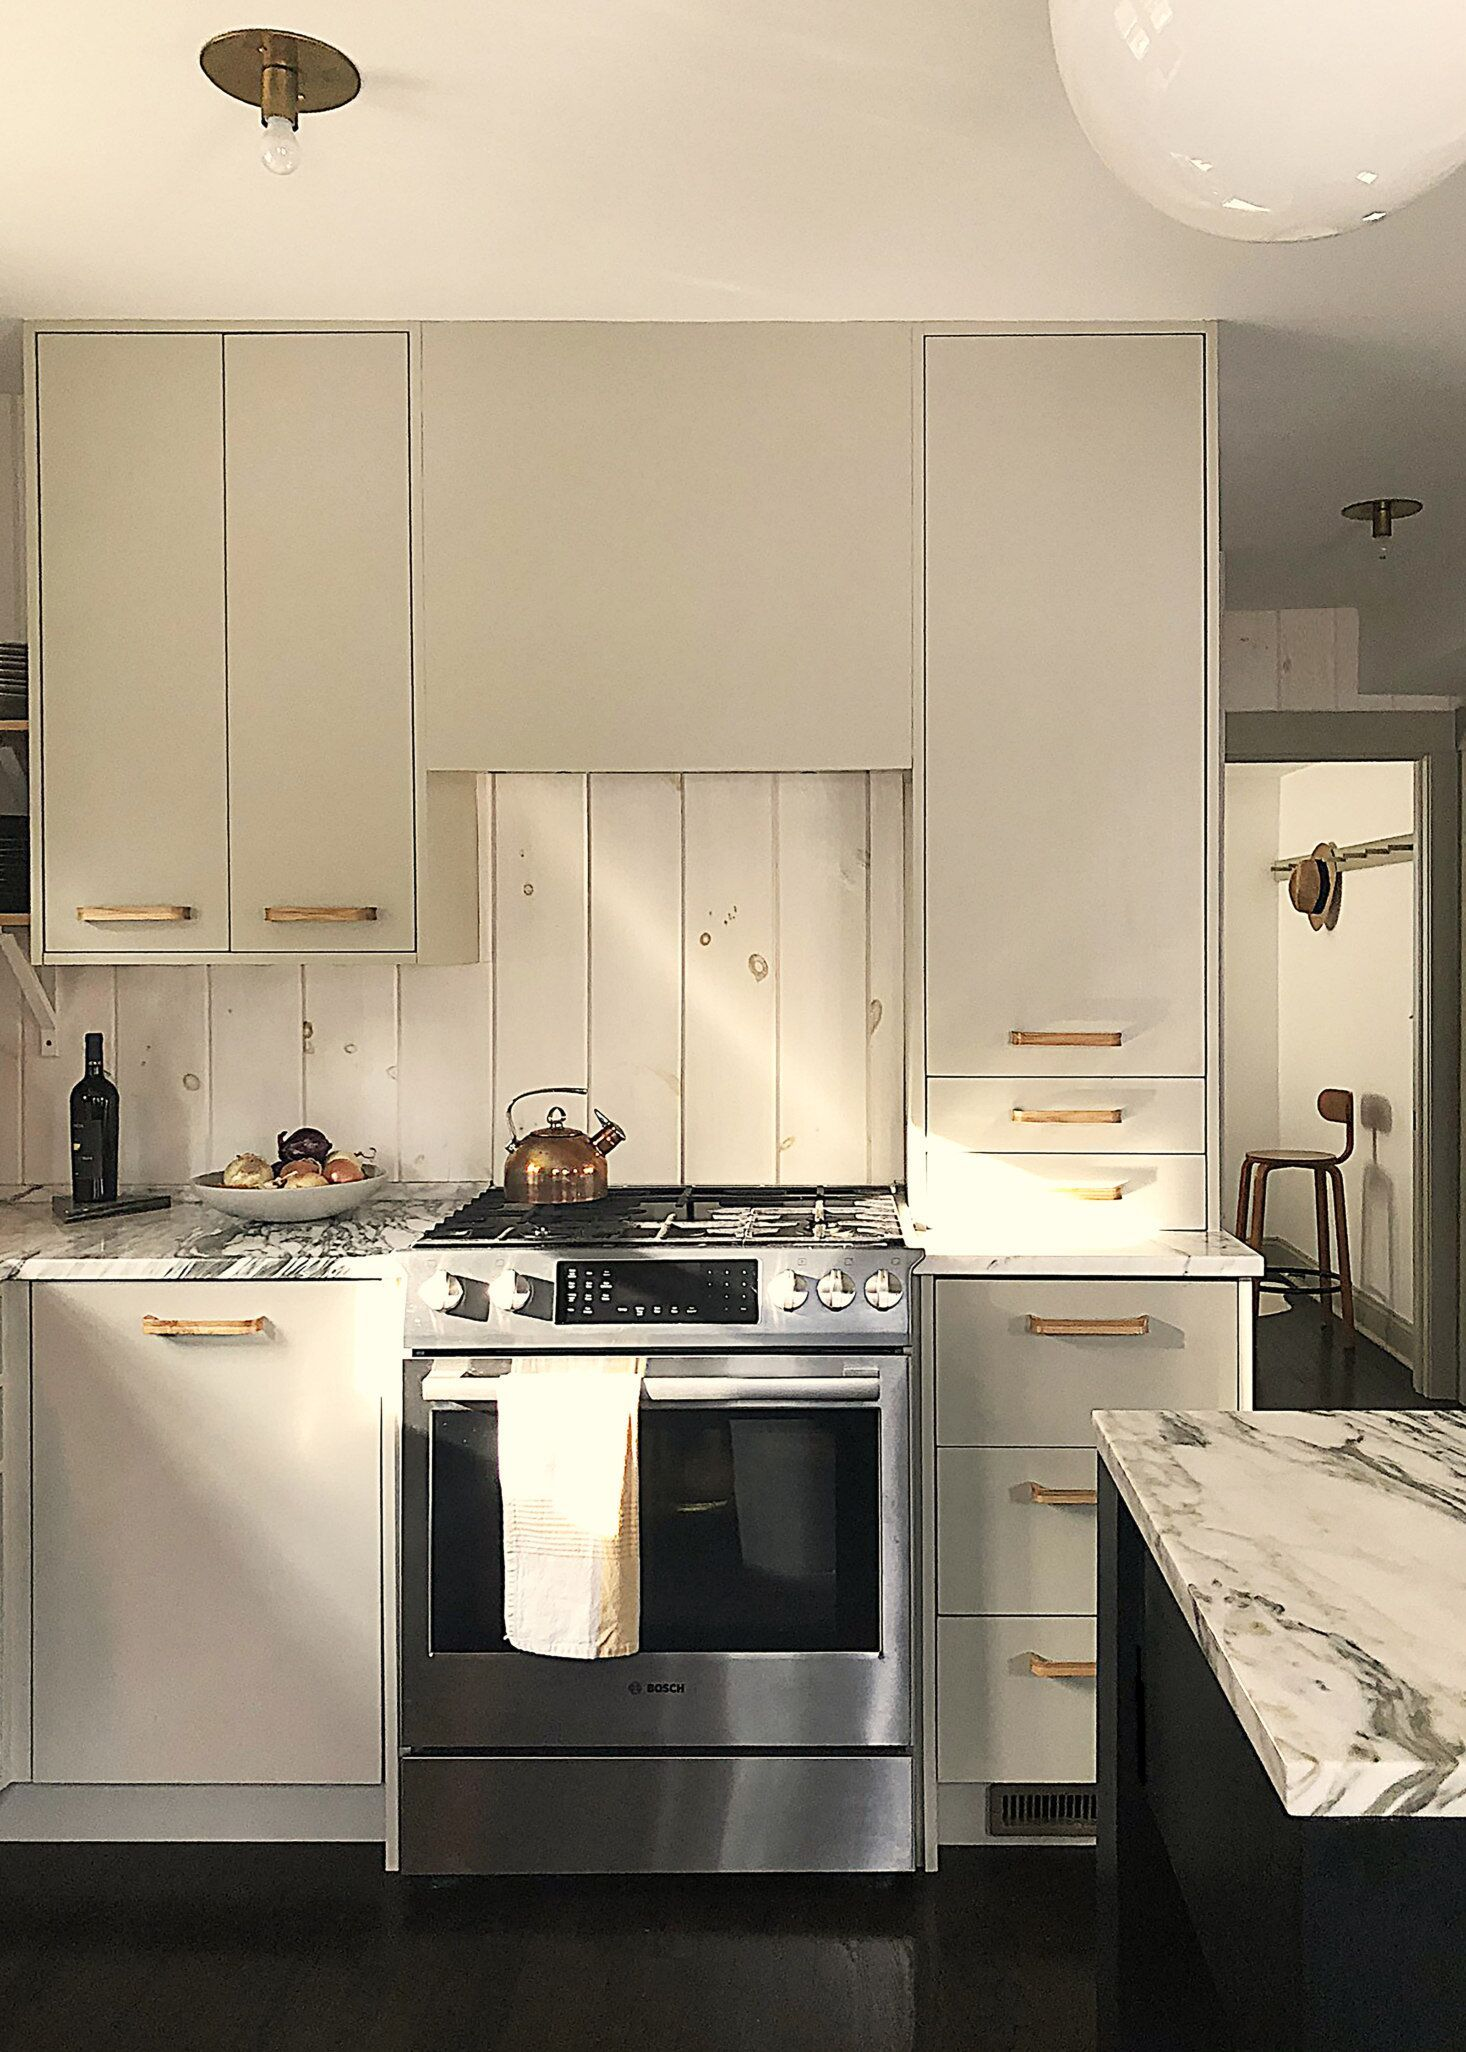 Diy Slab Door For Sektion Modern Country Kitchens Ikea Cabinets Ikea Kitchen